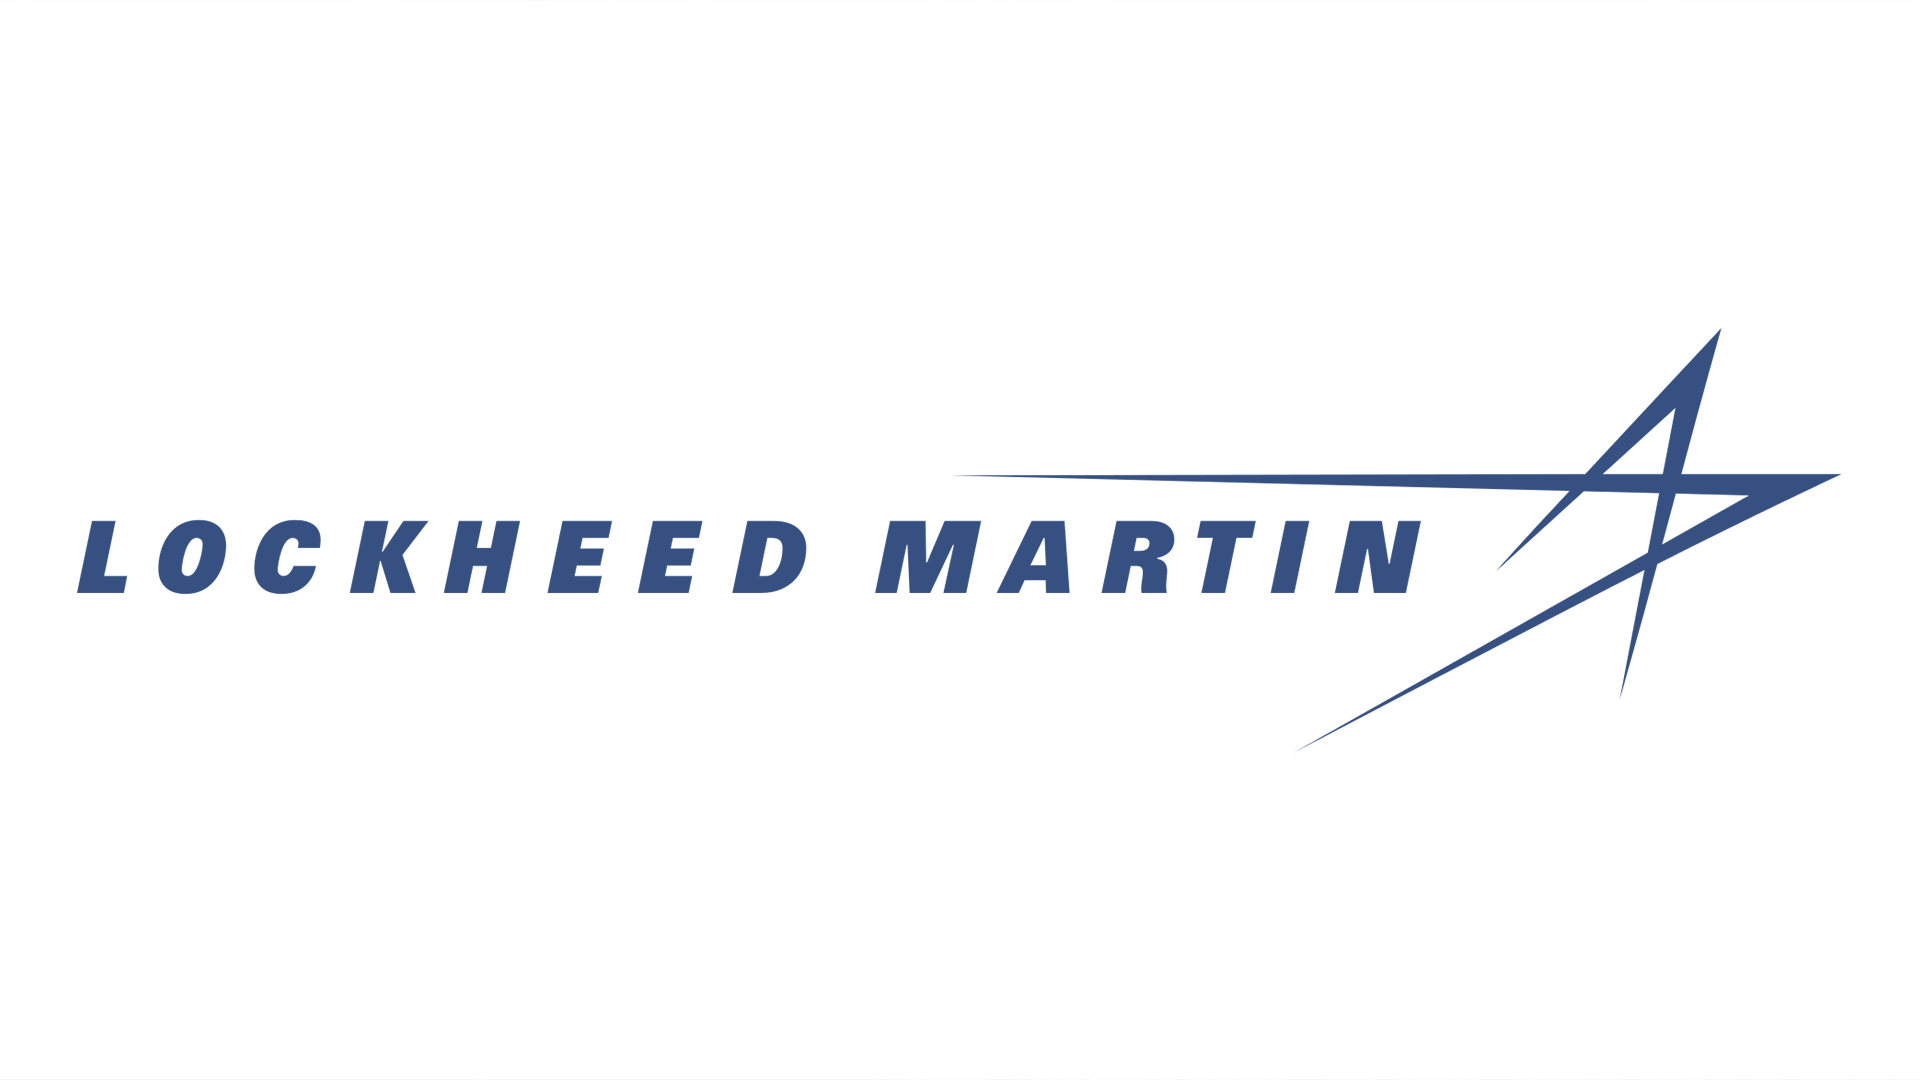 Lockheed Martin Partners With Aerojet Rocketdyne for NGI Contract Proposal